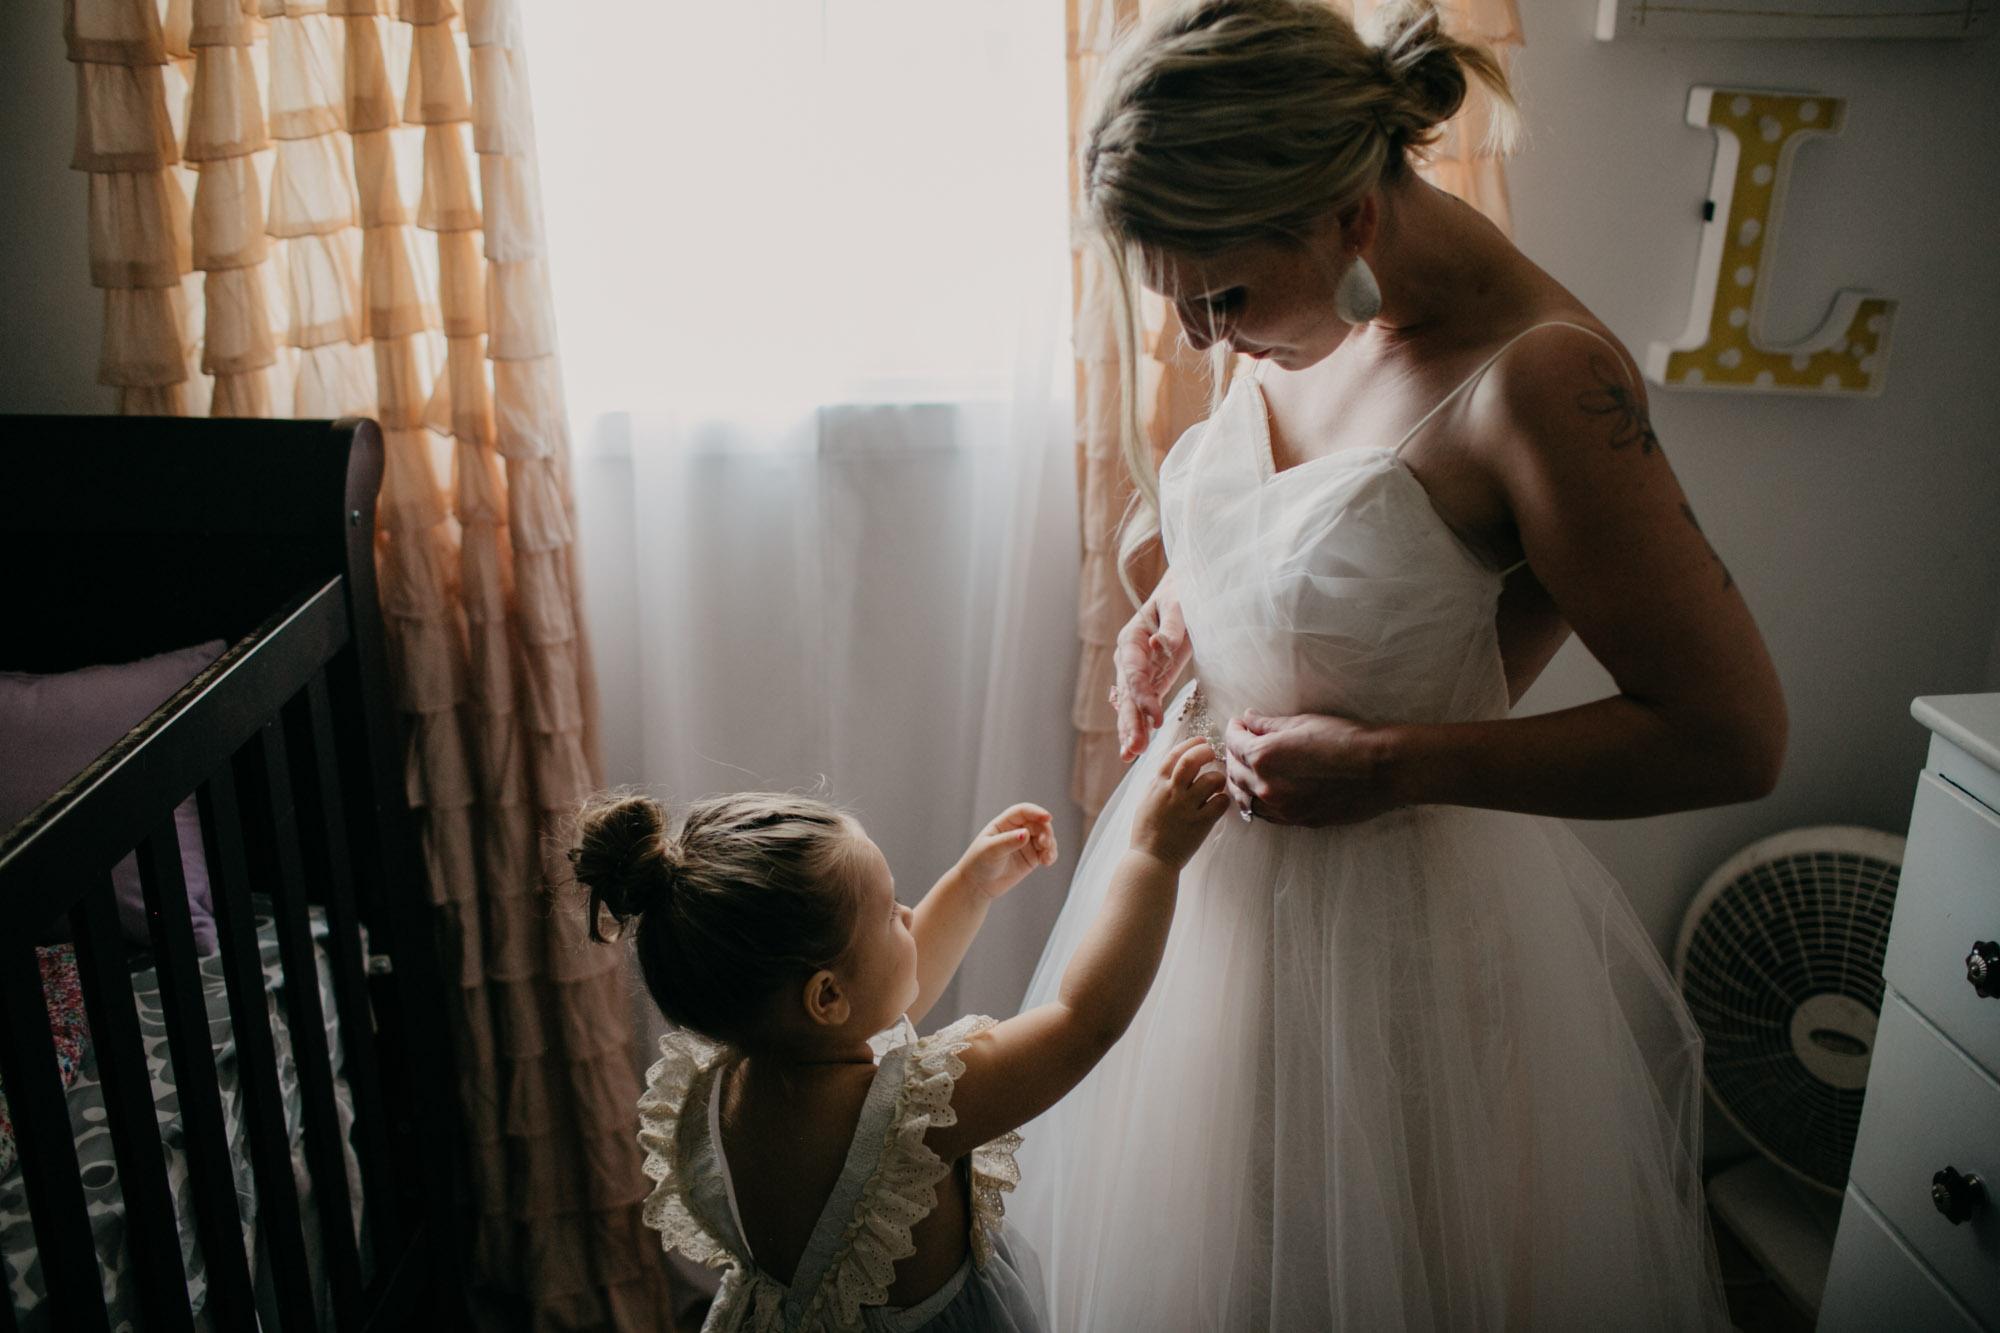 omaha-wedding-photographer-meghan-time-11.jpg